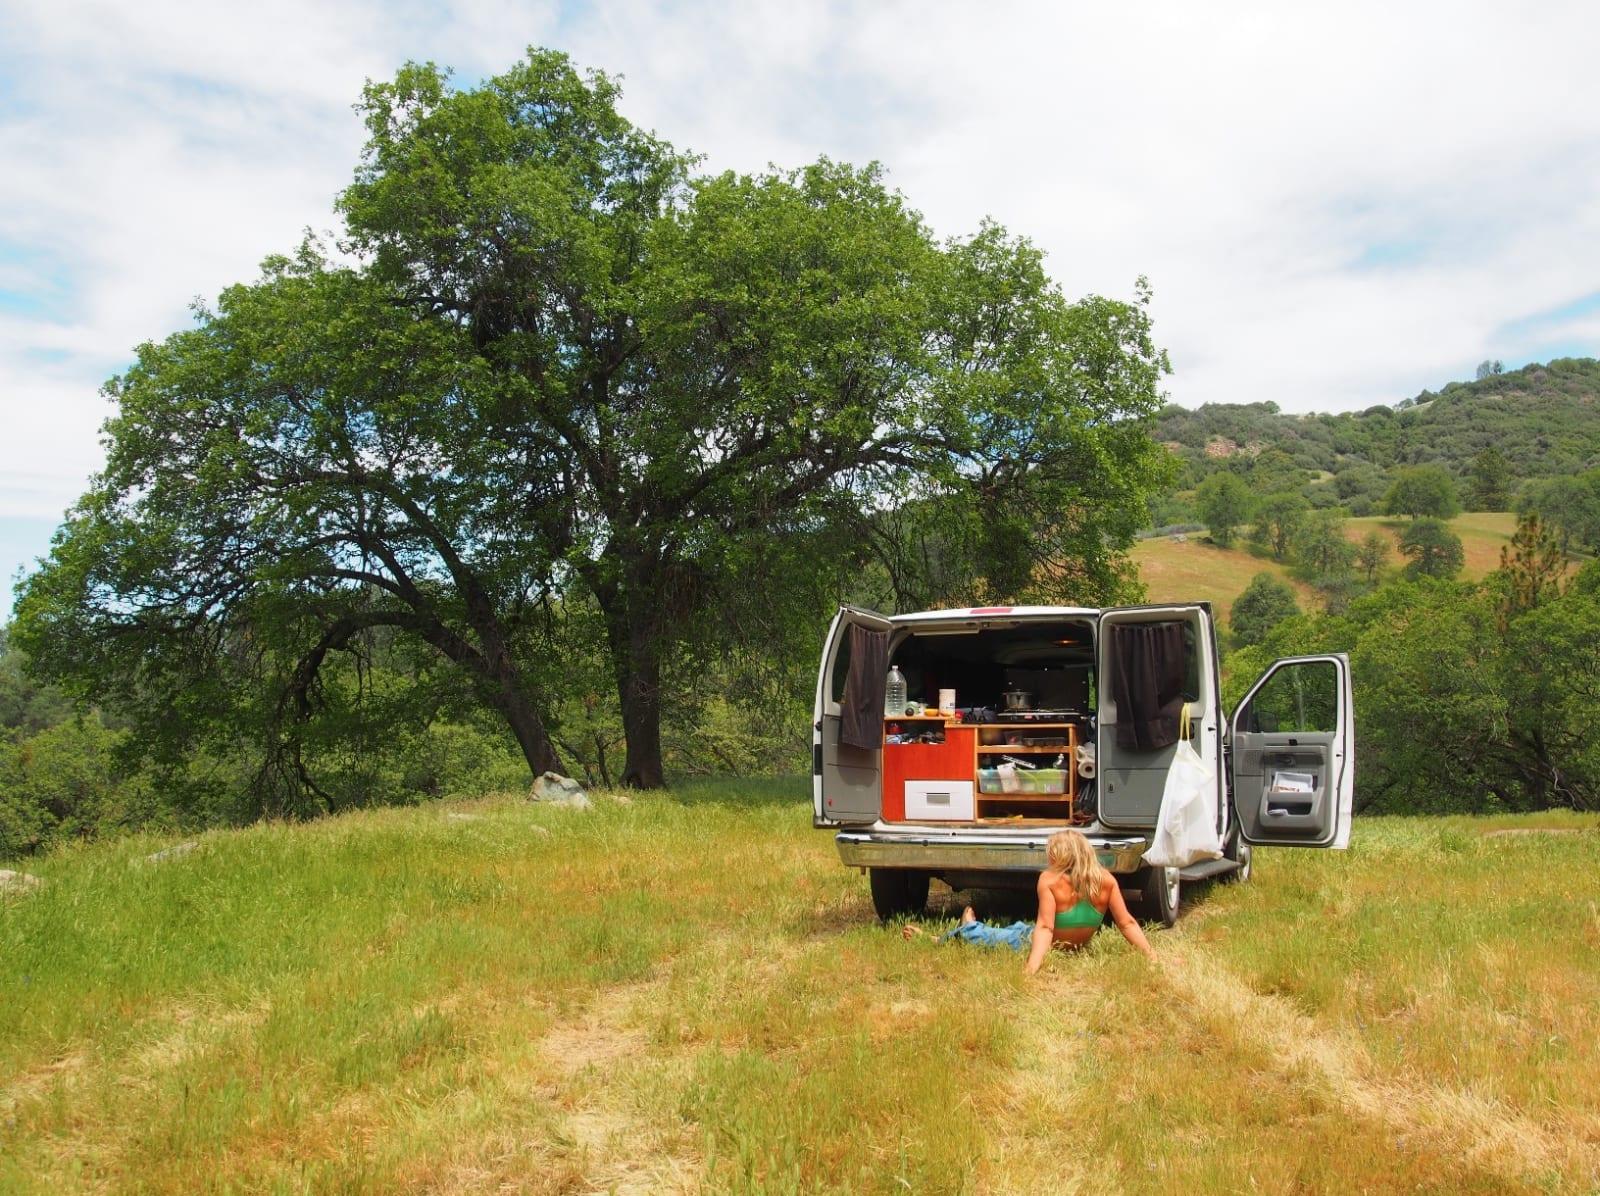 TRIVES PÅ LANGTUR: I sommer har Voldner reist landet rundt og klatre i forbindelse med et nytt bokprosjekt. På bildet er hun på langtur i USA. Bilde: Privat